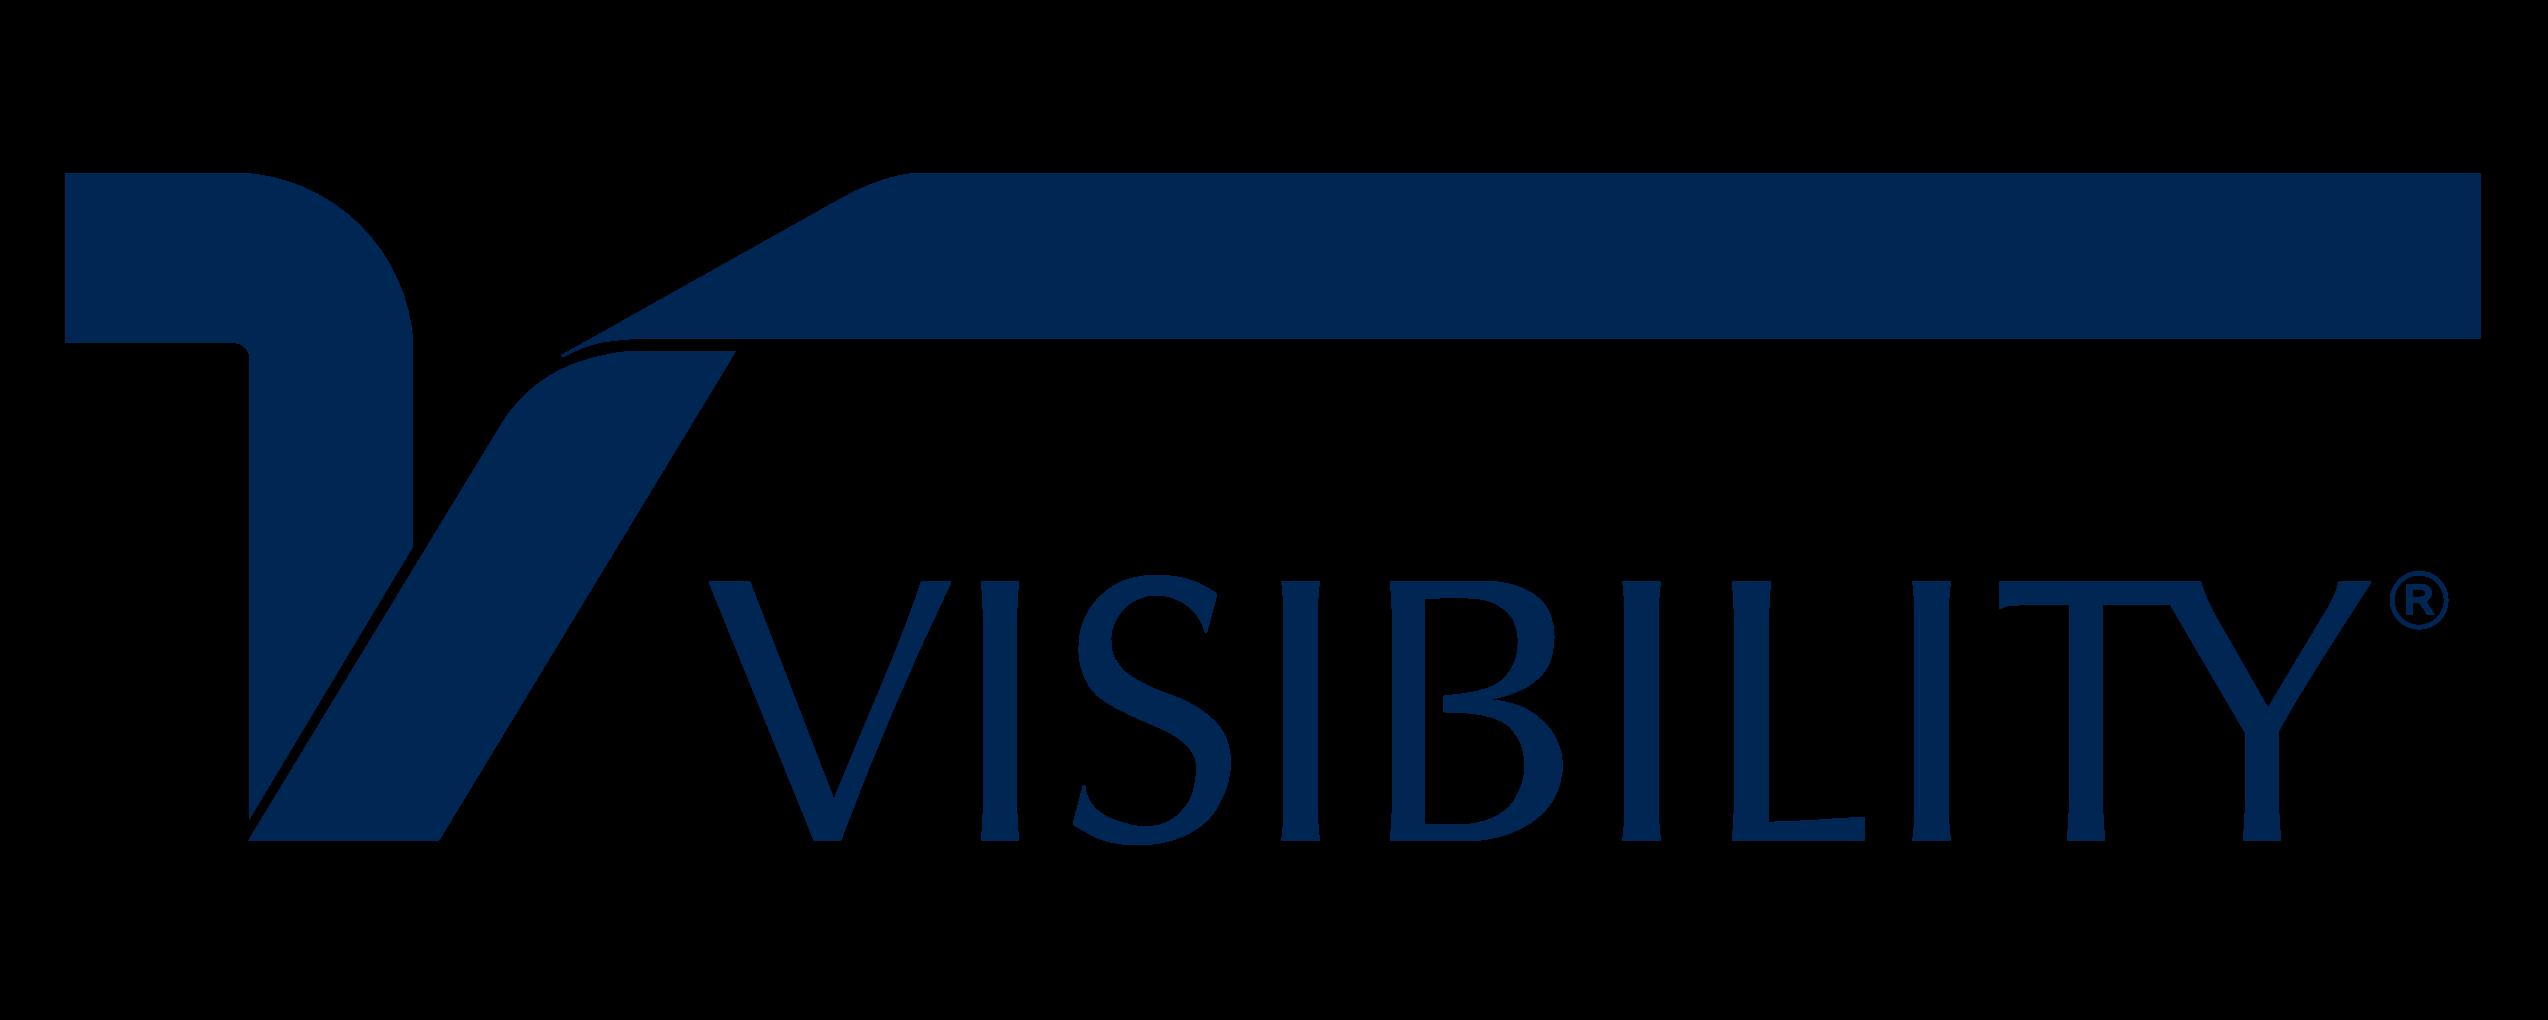 2018 New Website Logo